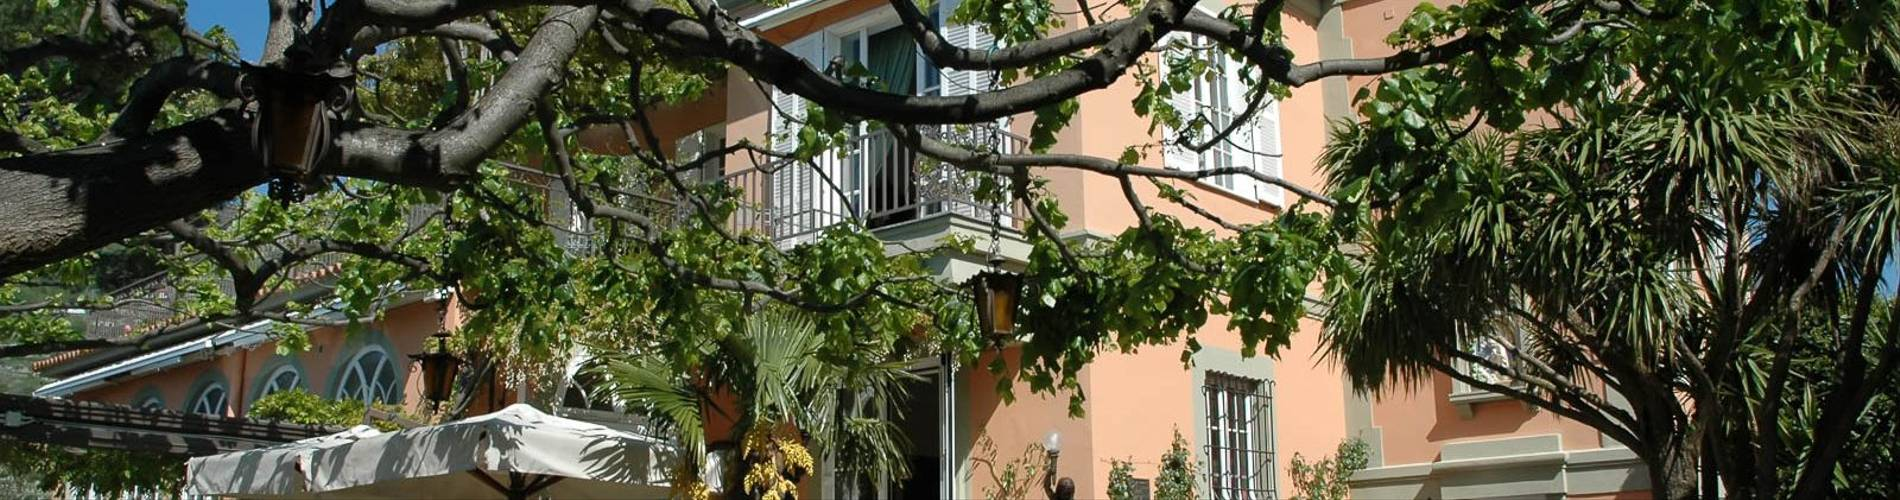 Villa Maria, Amalfi Coast, Italy (3).jpg